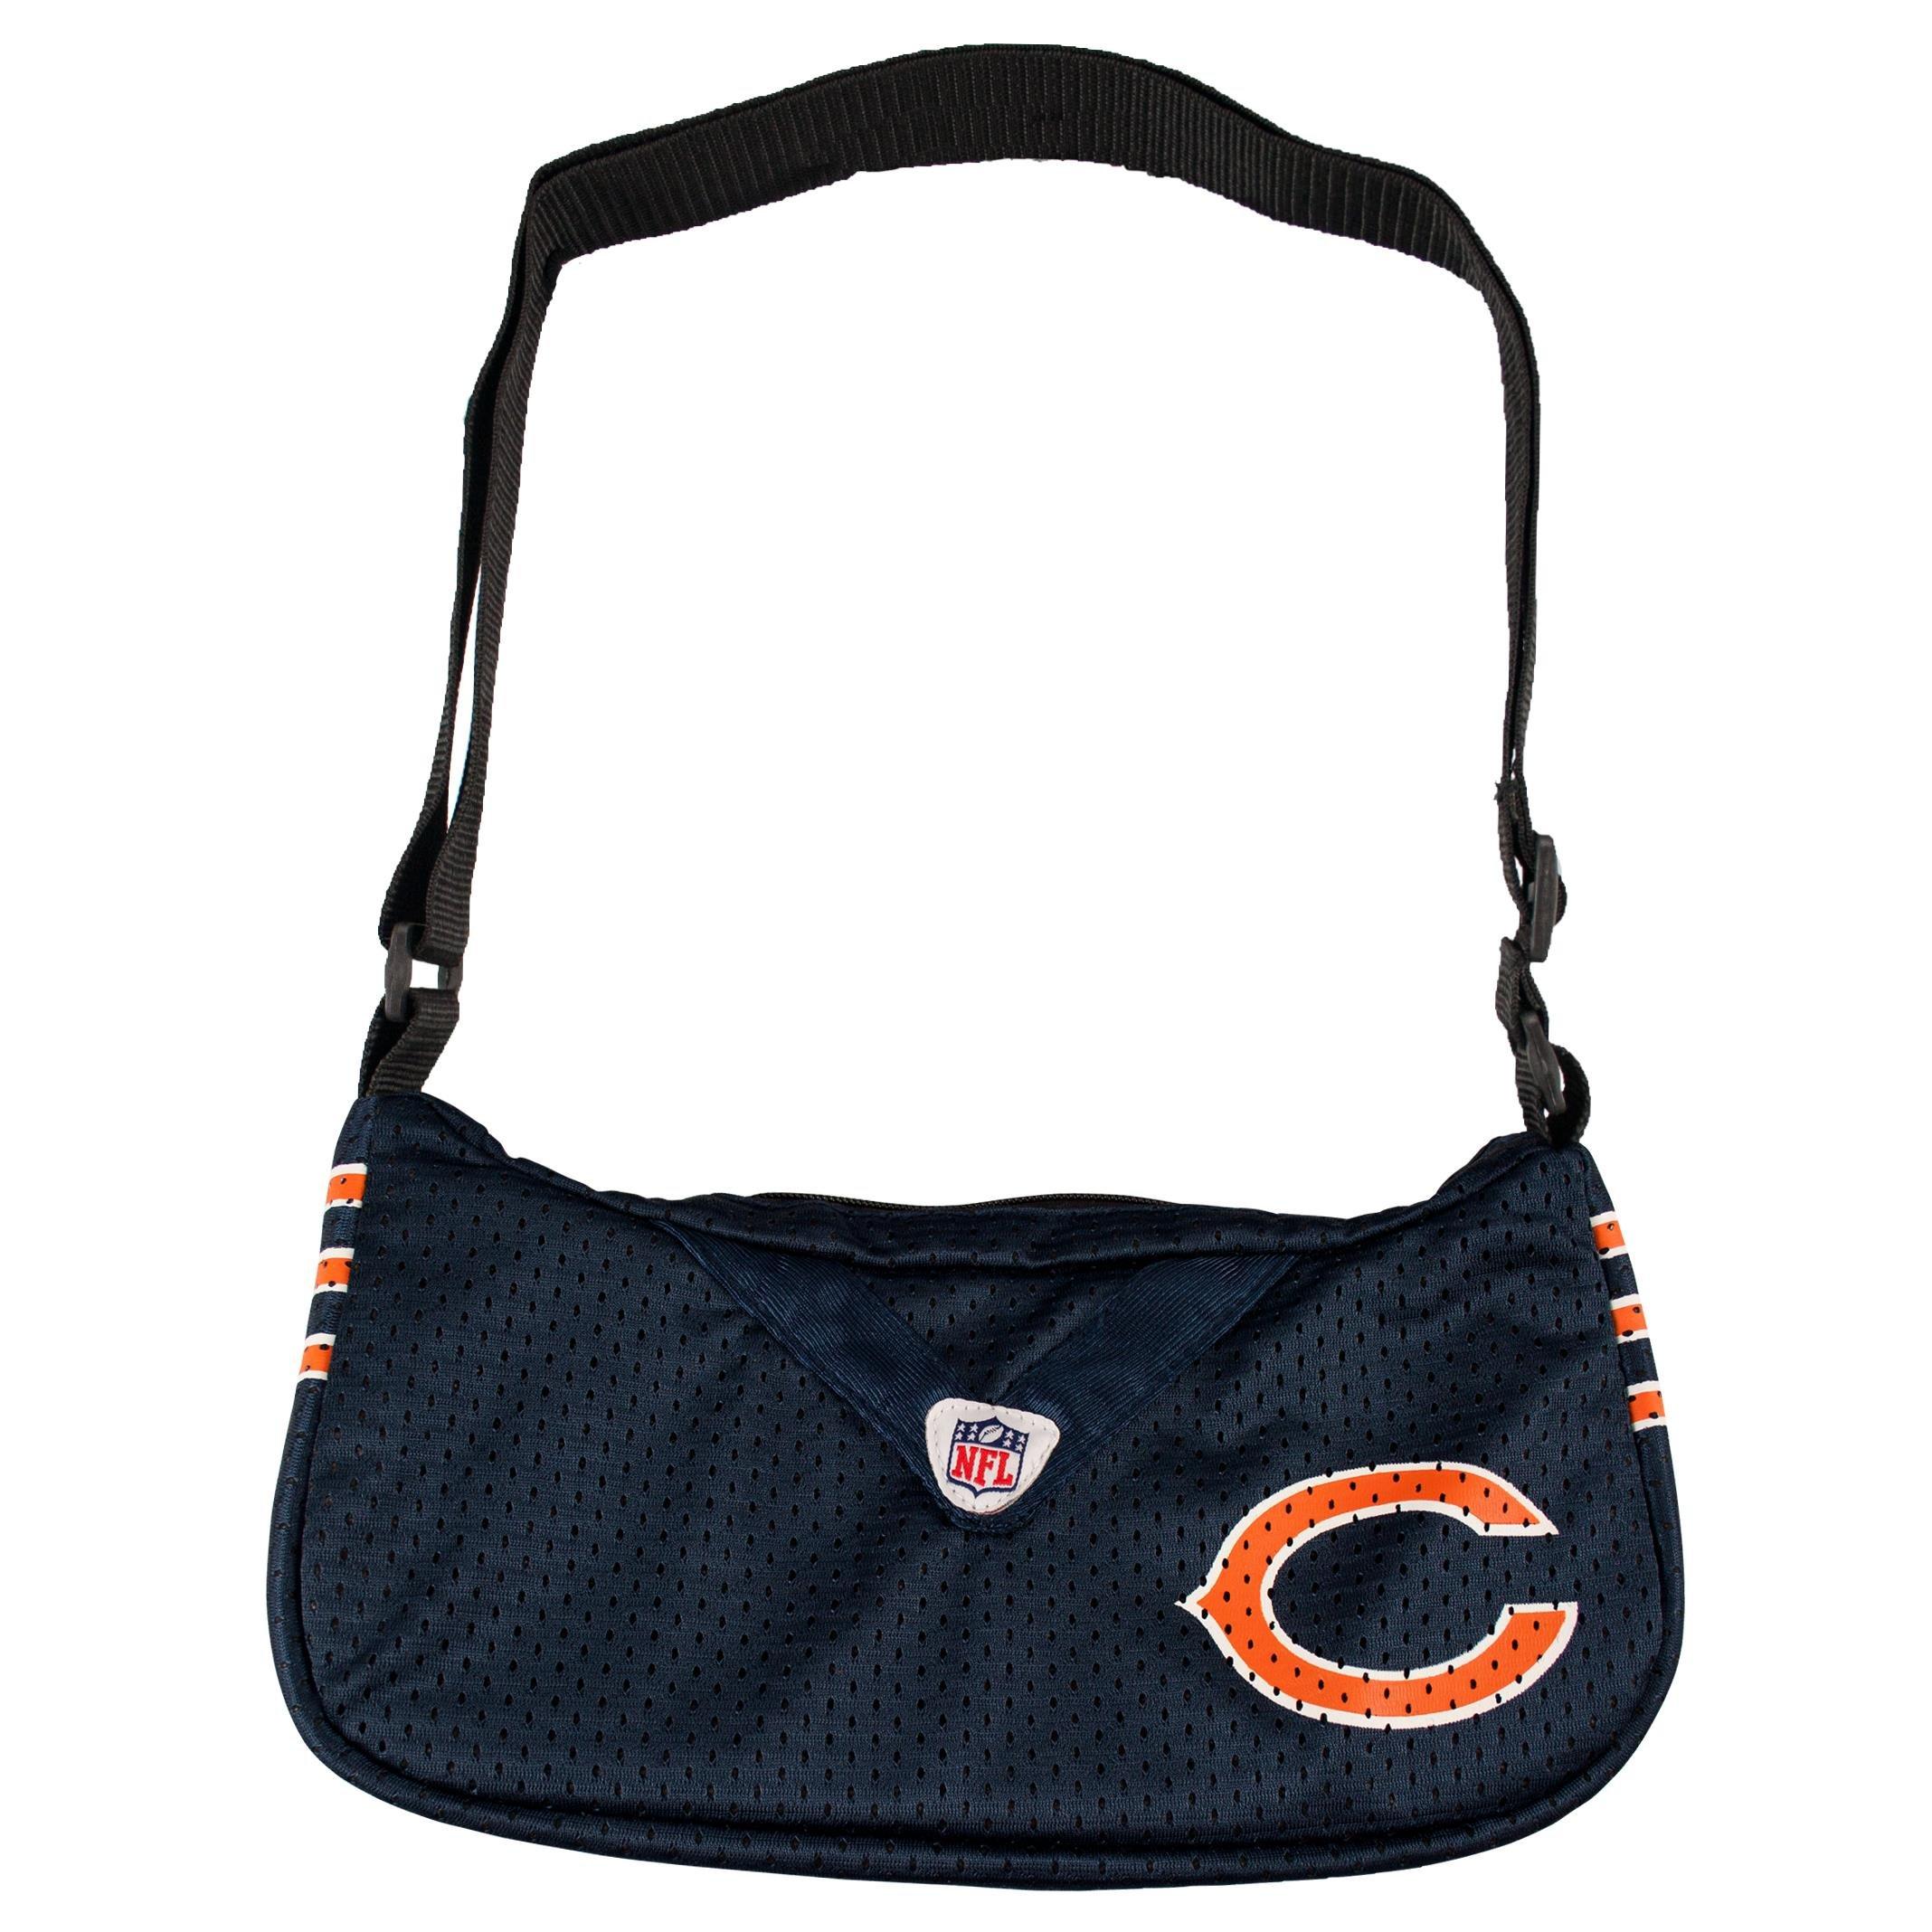 NFL Chicago Bears Jersey Team Purse